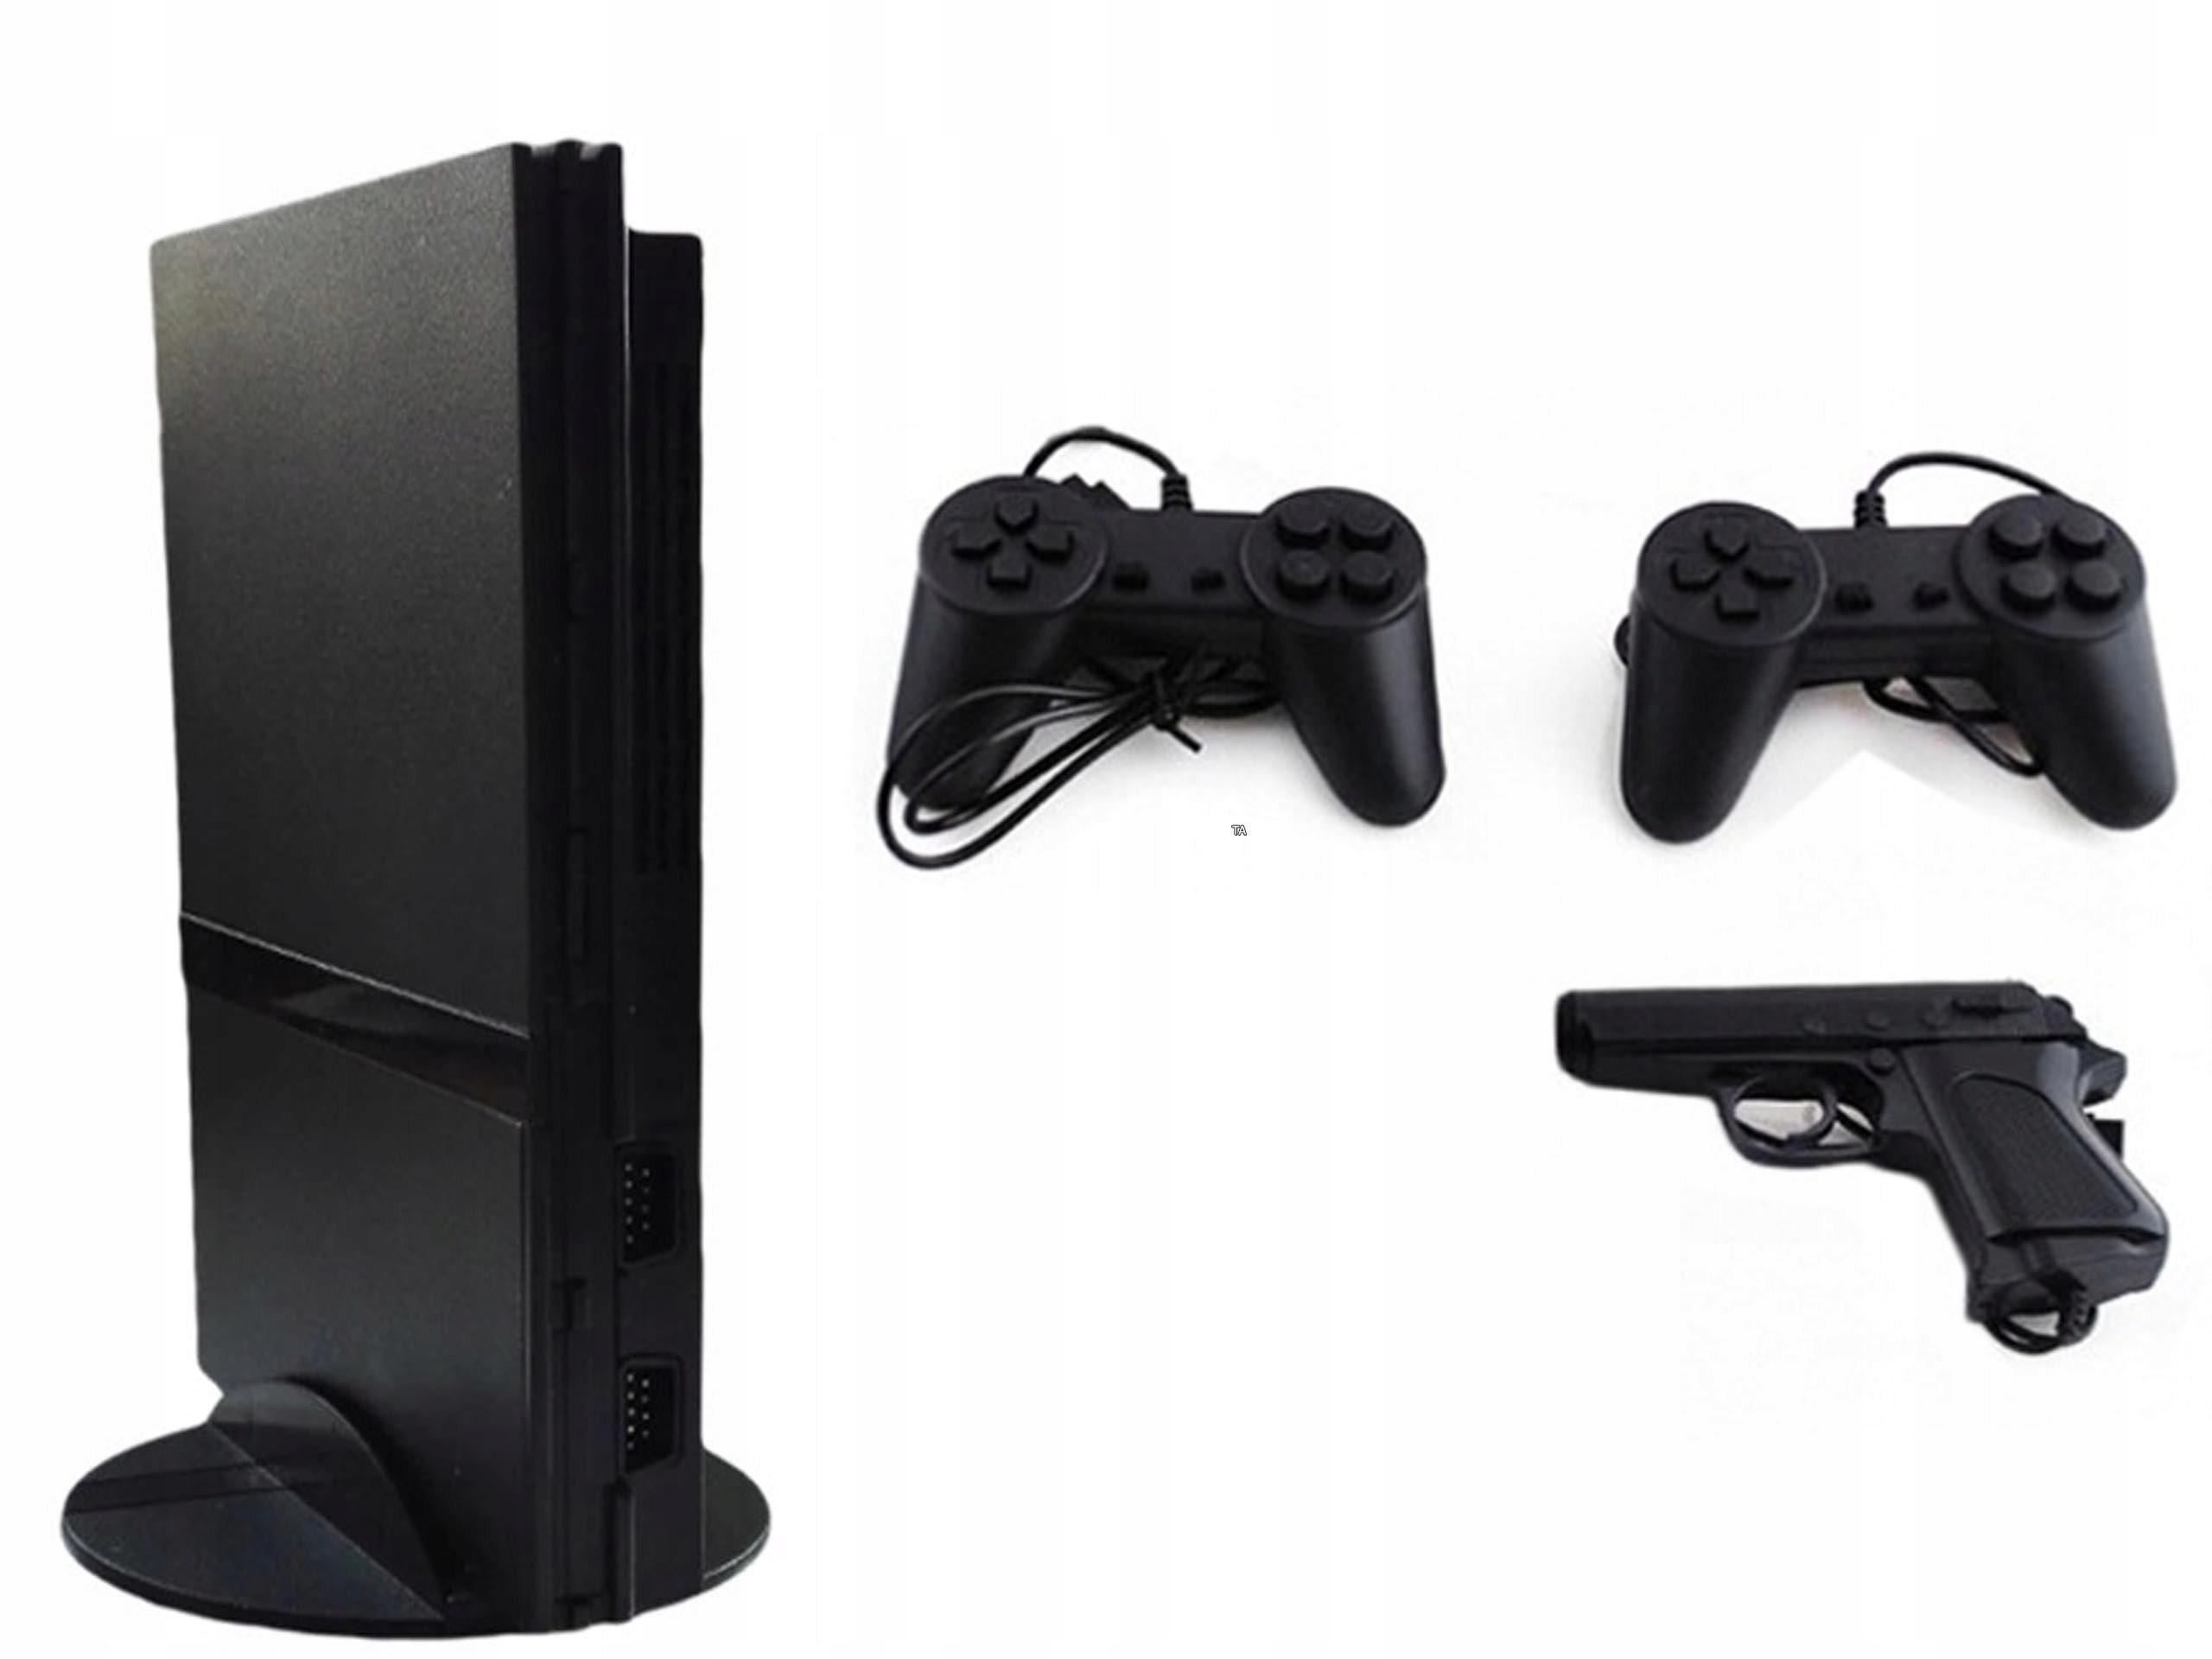 PEGASUS GAME TELEVISION PAD GUN